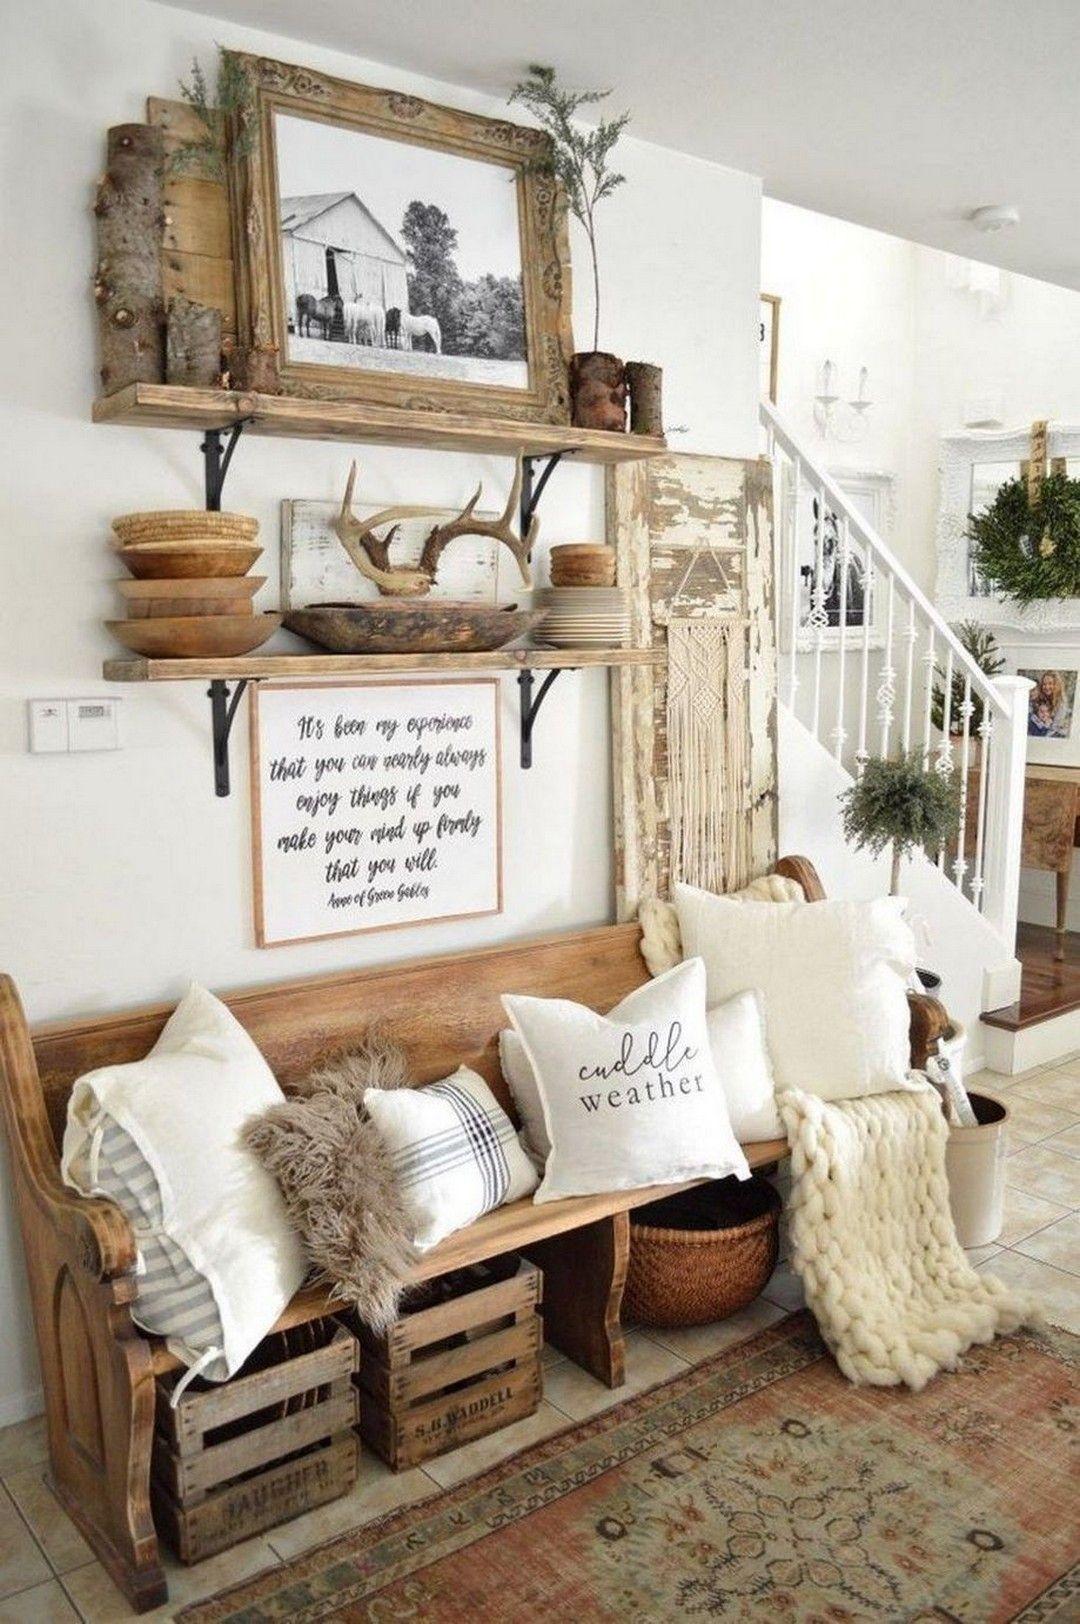 33 Rustic Farmhouse Decor Ideas images